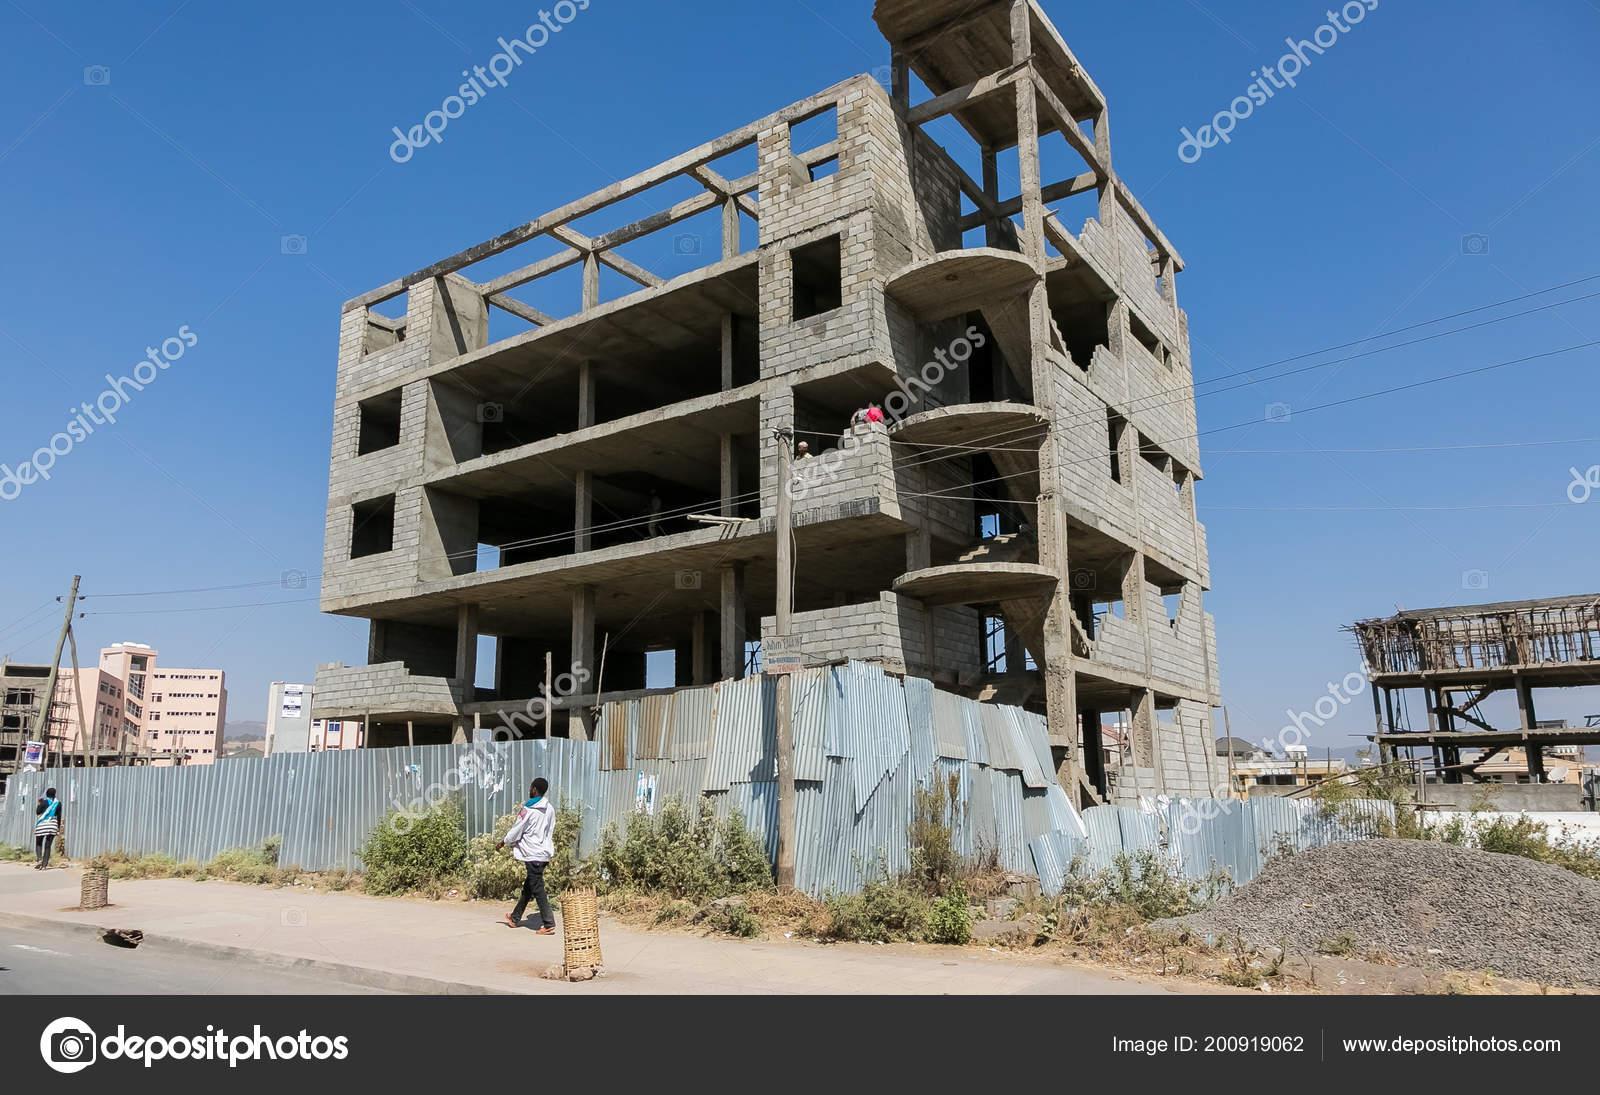 Addis Ababa Ethiopia January 2014 Urban Construction Site